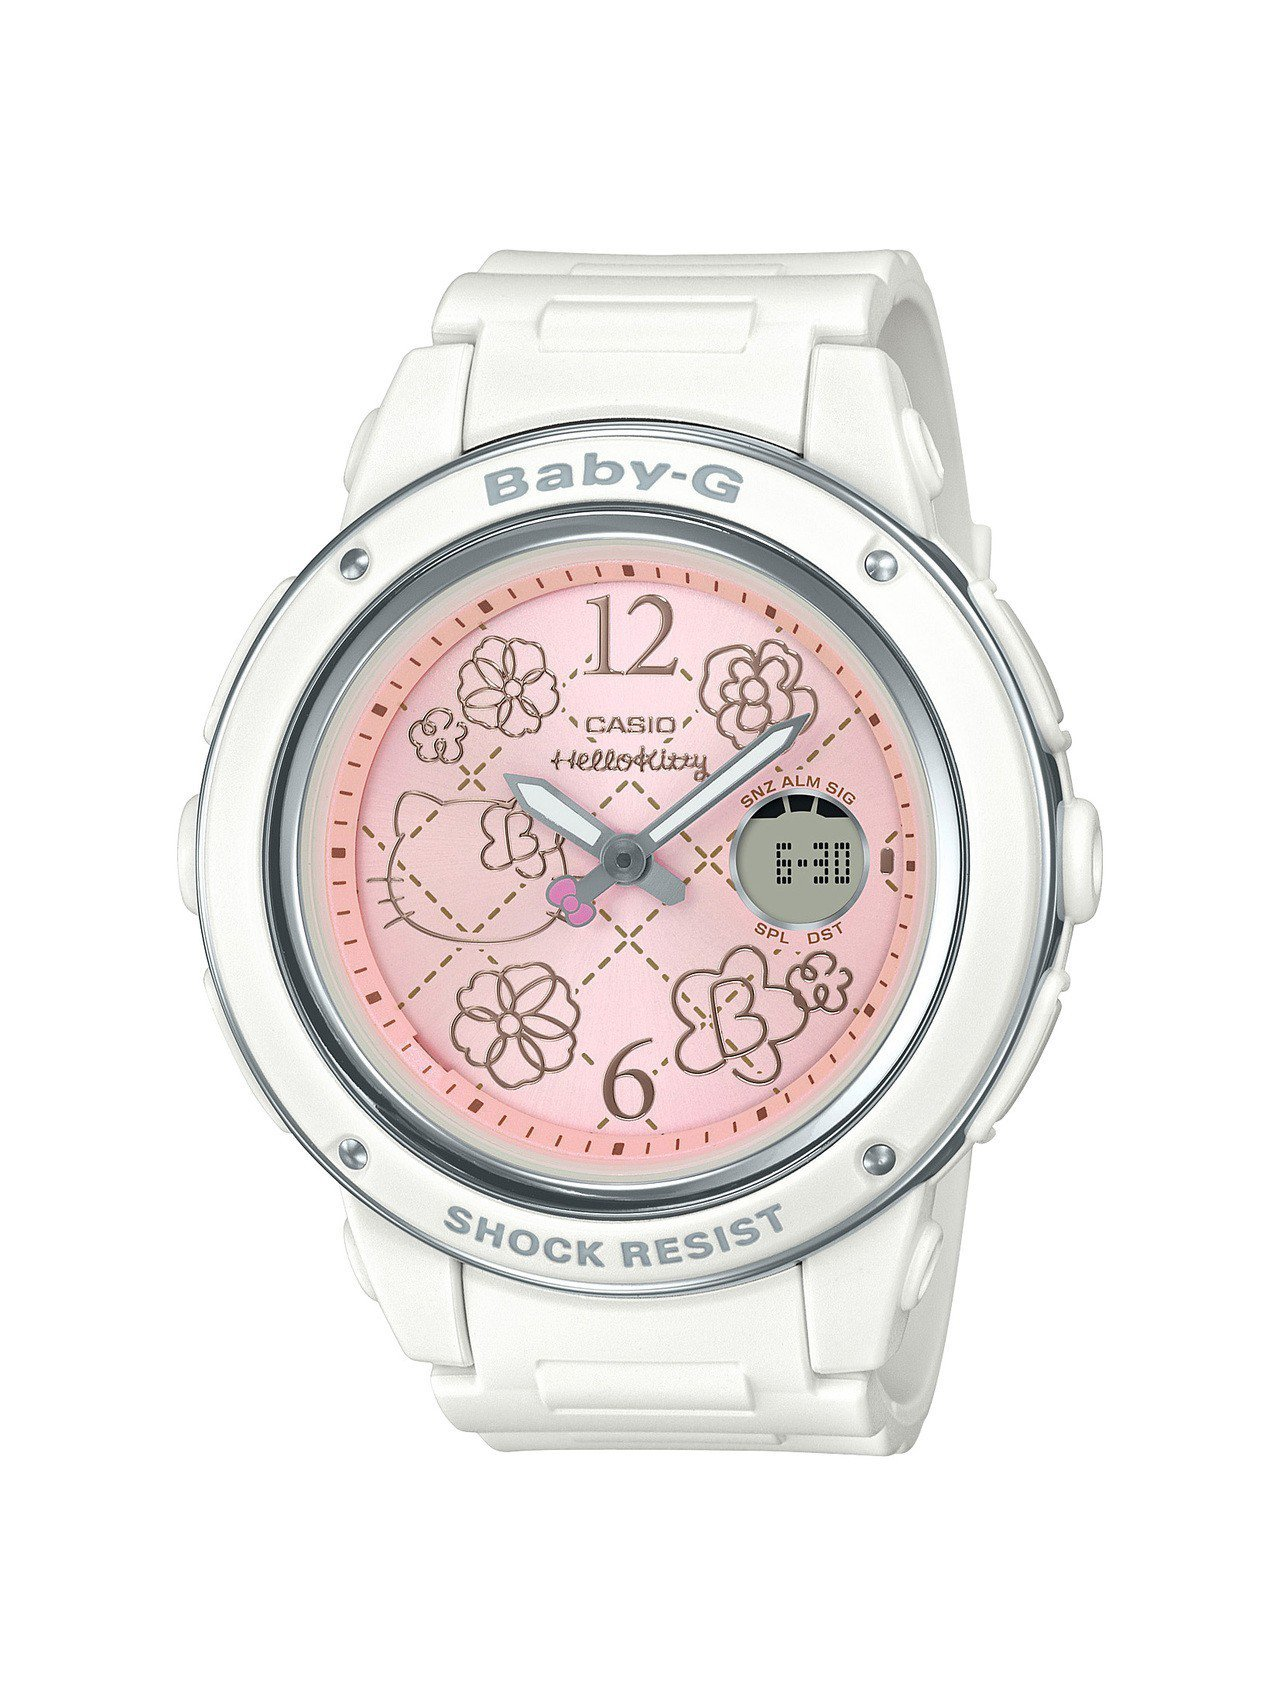 Baby-G BGA-150KT-7B腕表,白色表殼搭配粉紅色表盤,5,500...